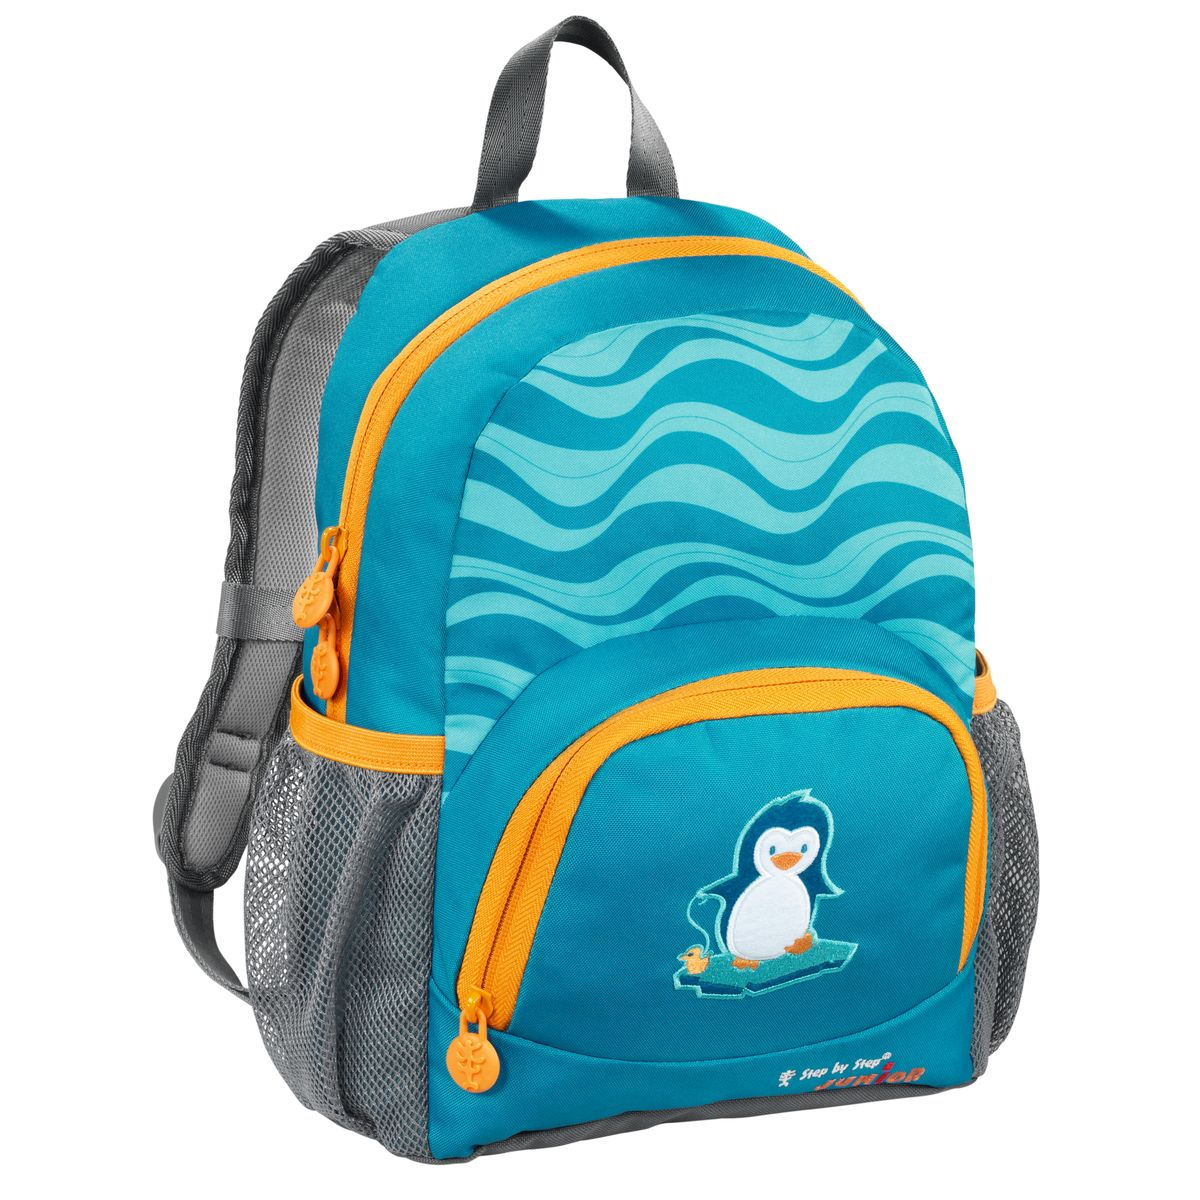 Hama Рюкзак детский Step By Step Junior Dressy Little Penguin72523WDРюкзак детский Step By Step Junior Dressy little penguin голубой/серый